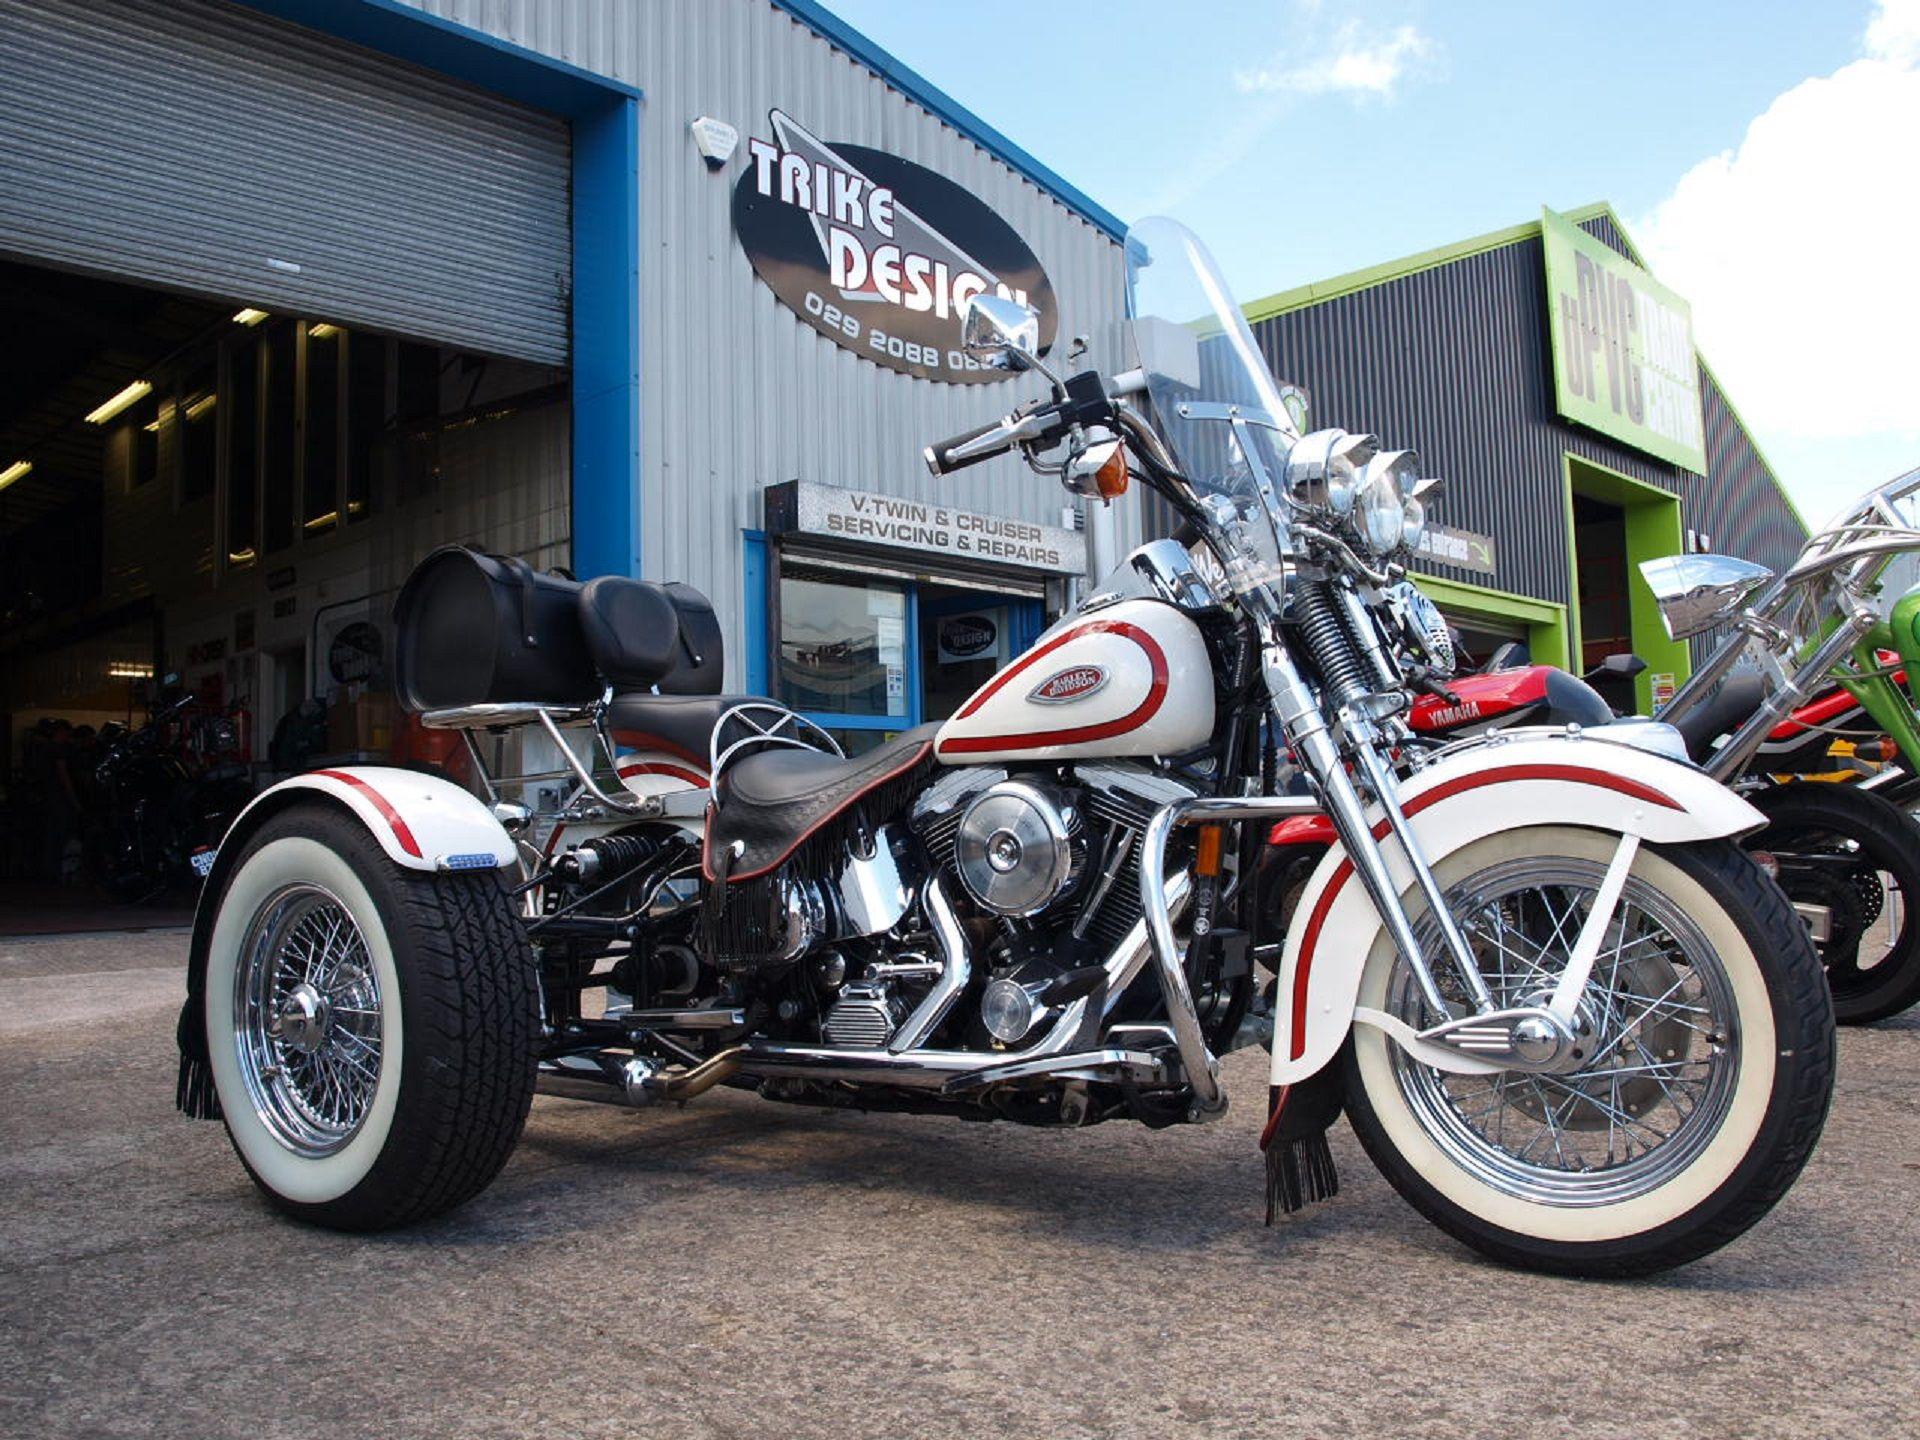 Harley Heritage Springer Trike Http Trike Design Co Uk Used Trikes For Sale Uk Trikes Bikes Sale Trike Harley Davidson Trike Cool Bikes